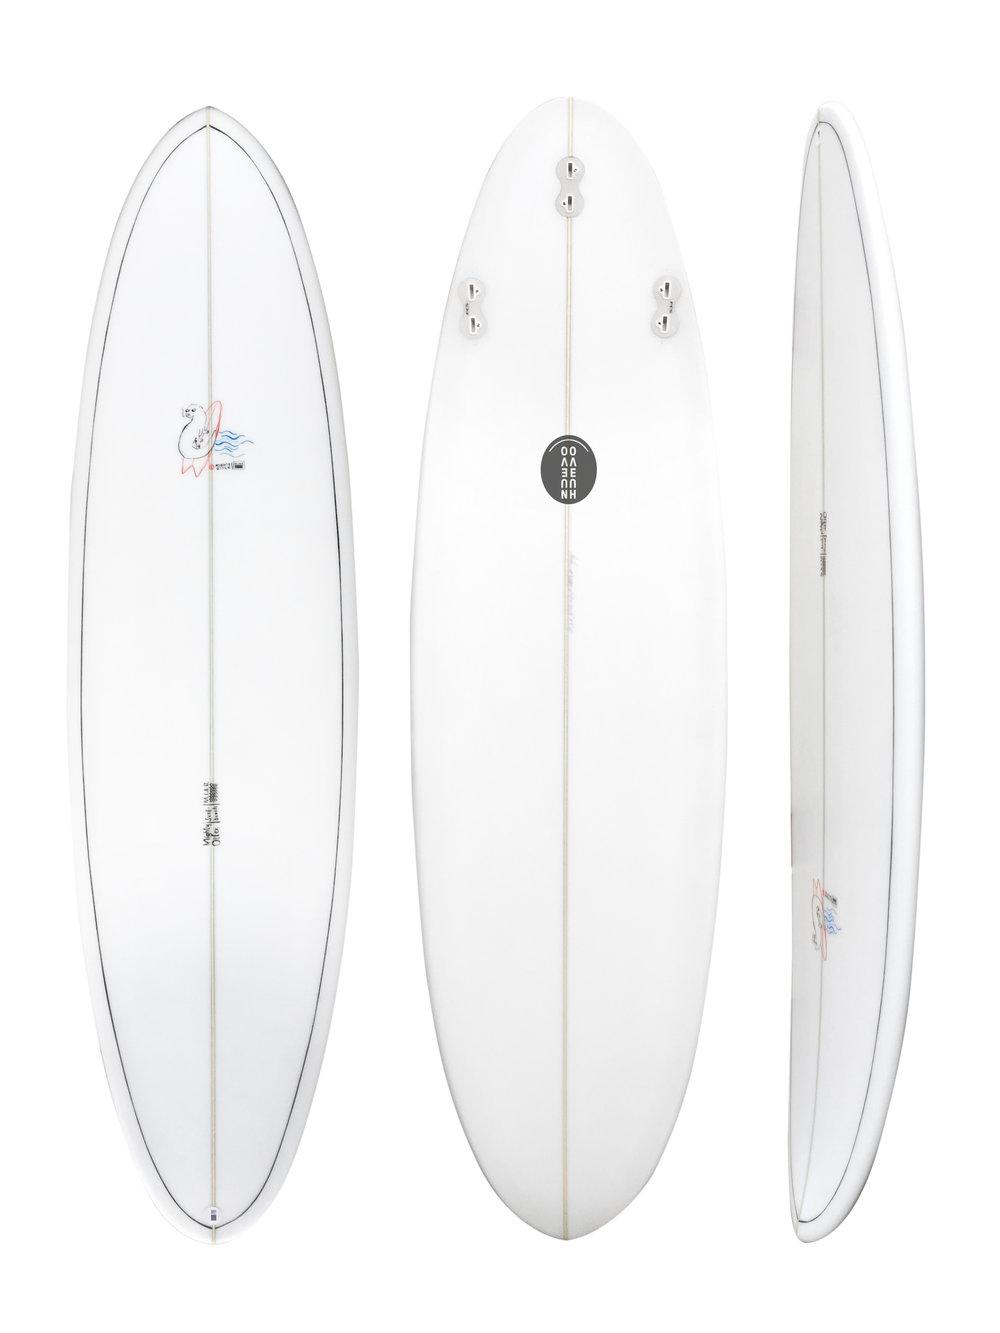 MightyOtterSurfboards_egg_fun-in-allen-größen-huevonuevo_.jpg